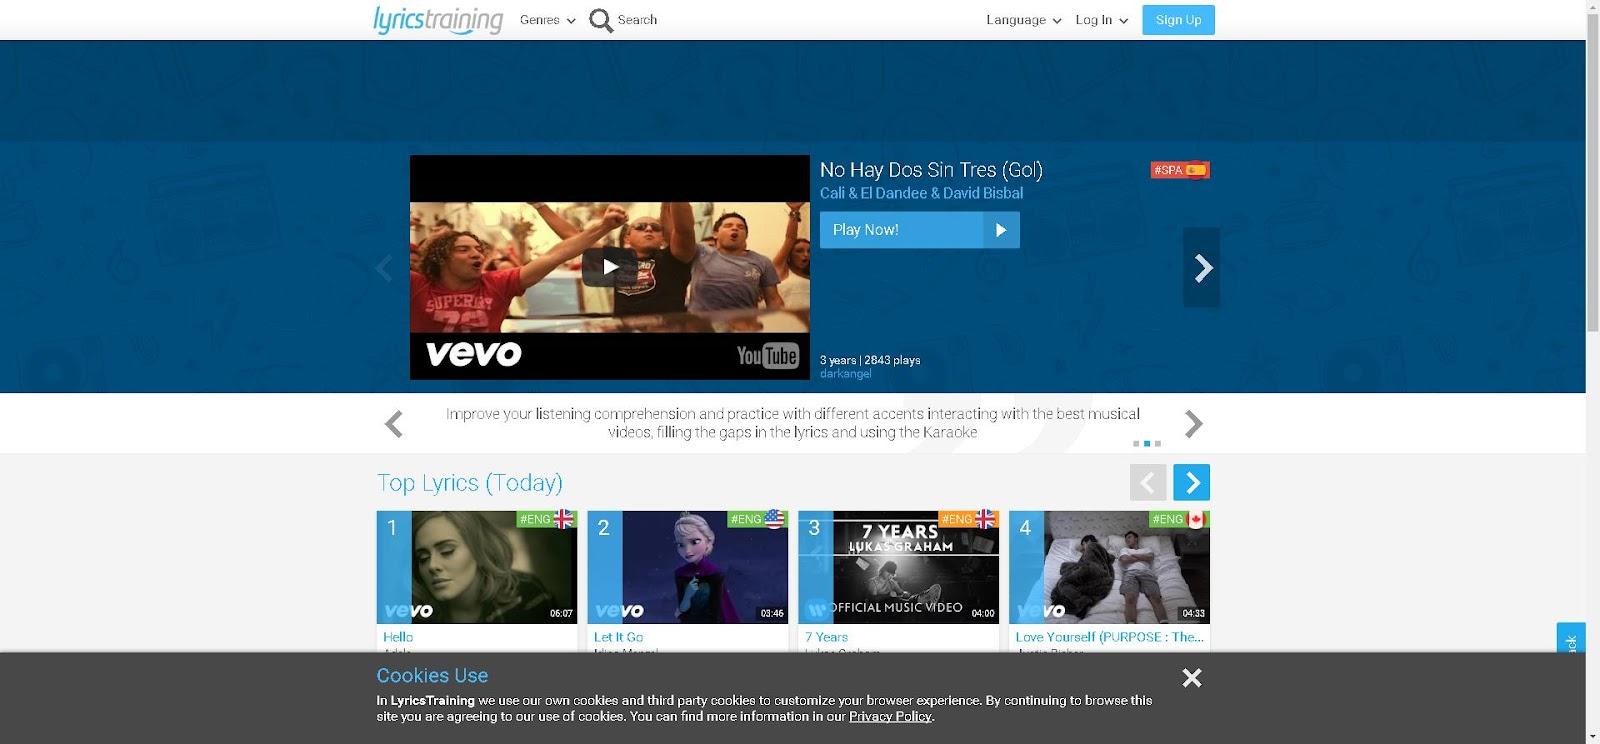 Learn Languages with Music Videos, Lyrics and Karaoke!.jpg